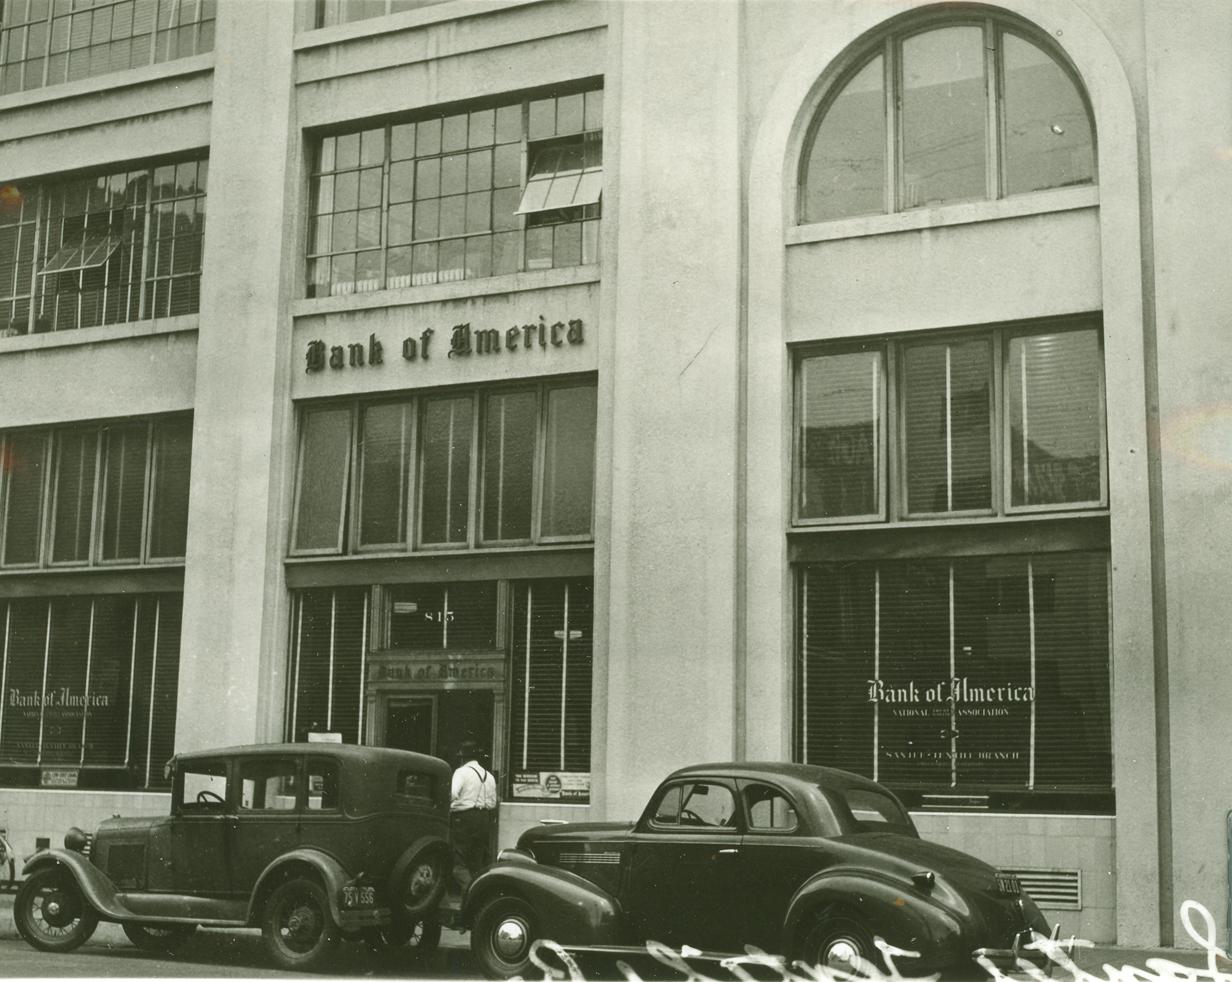 Maxfield Building facade, historic photograph.